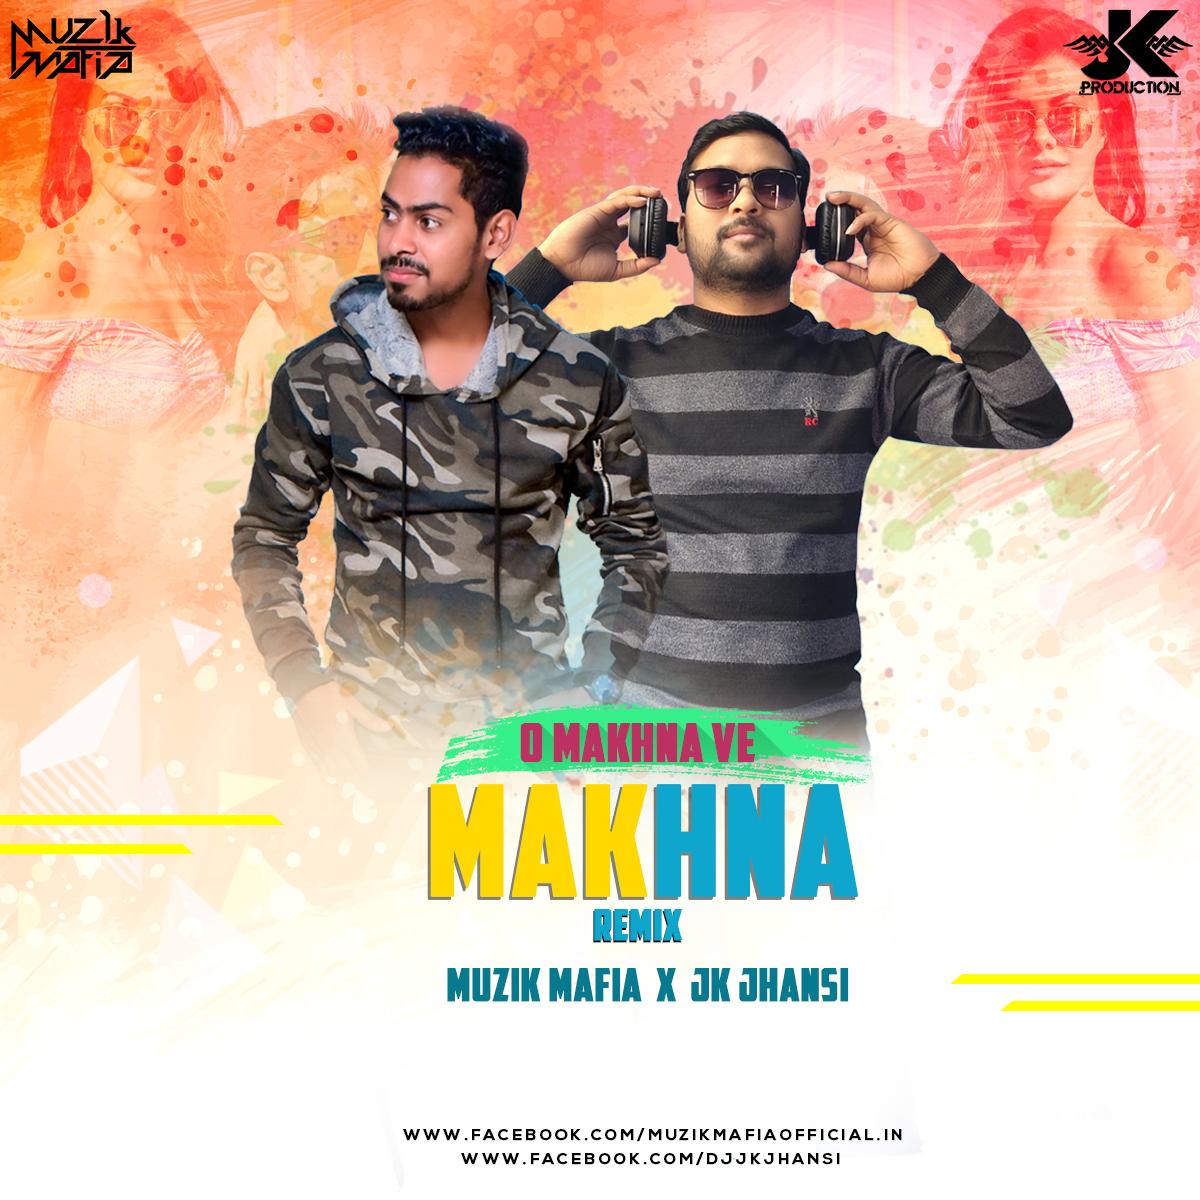 Makhna Remix (Drive) - DJ JK & Muzik Mafia